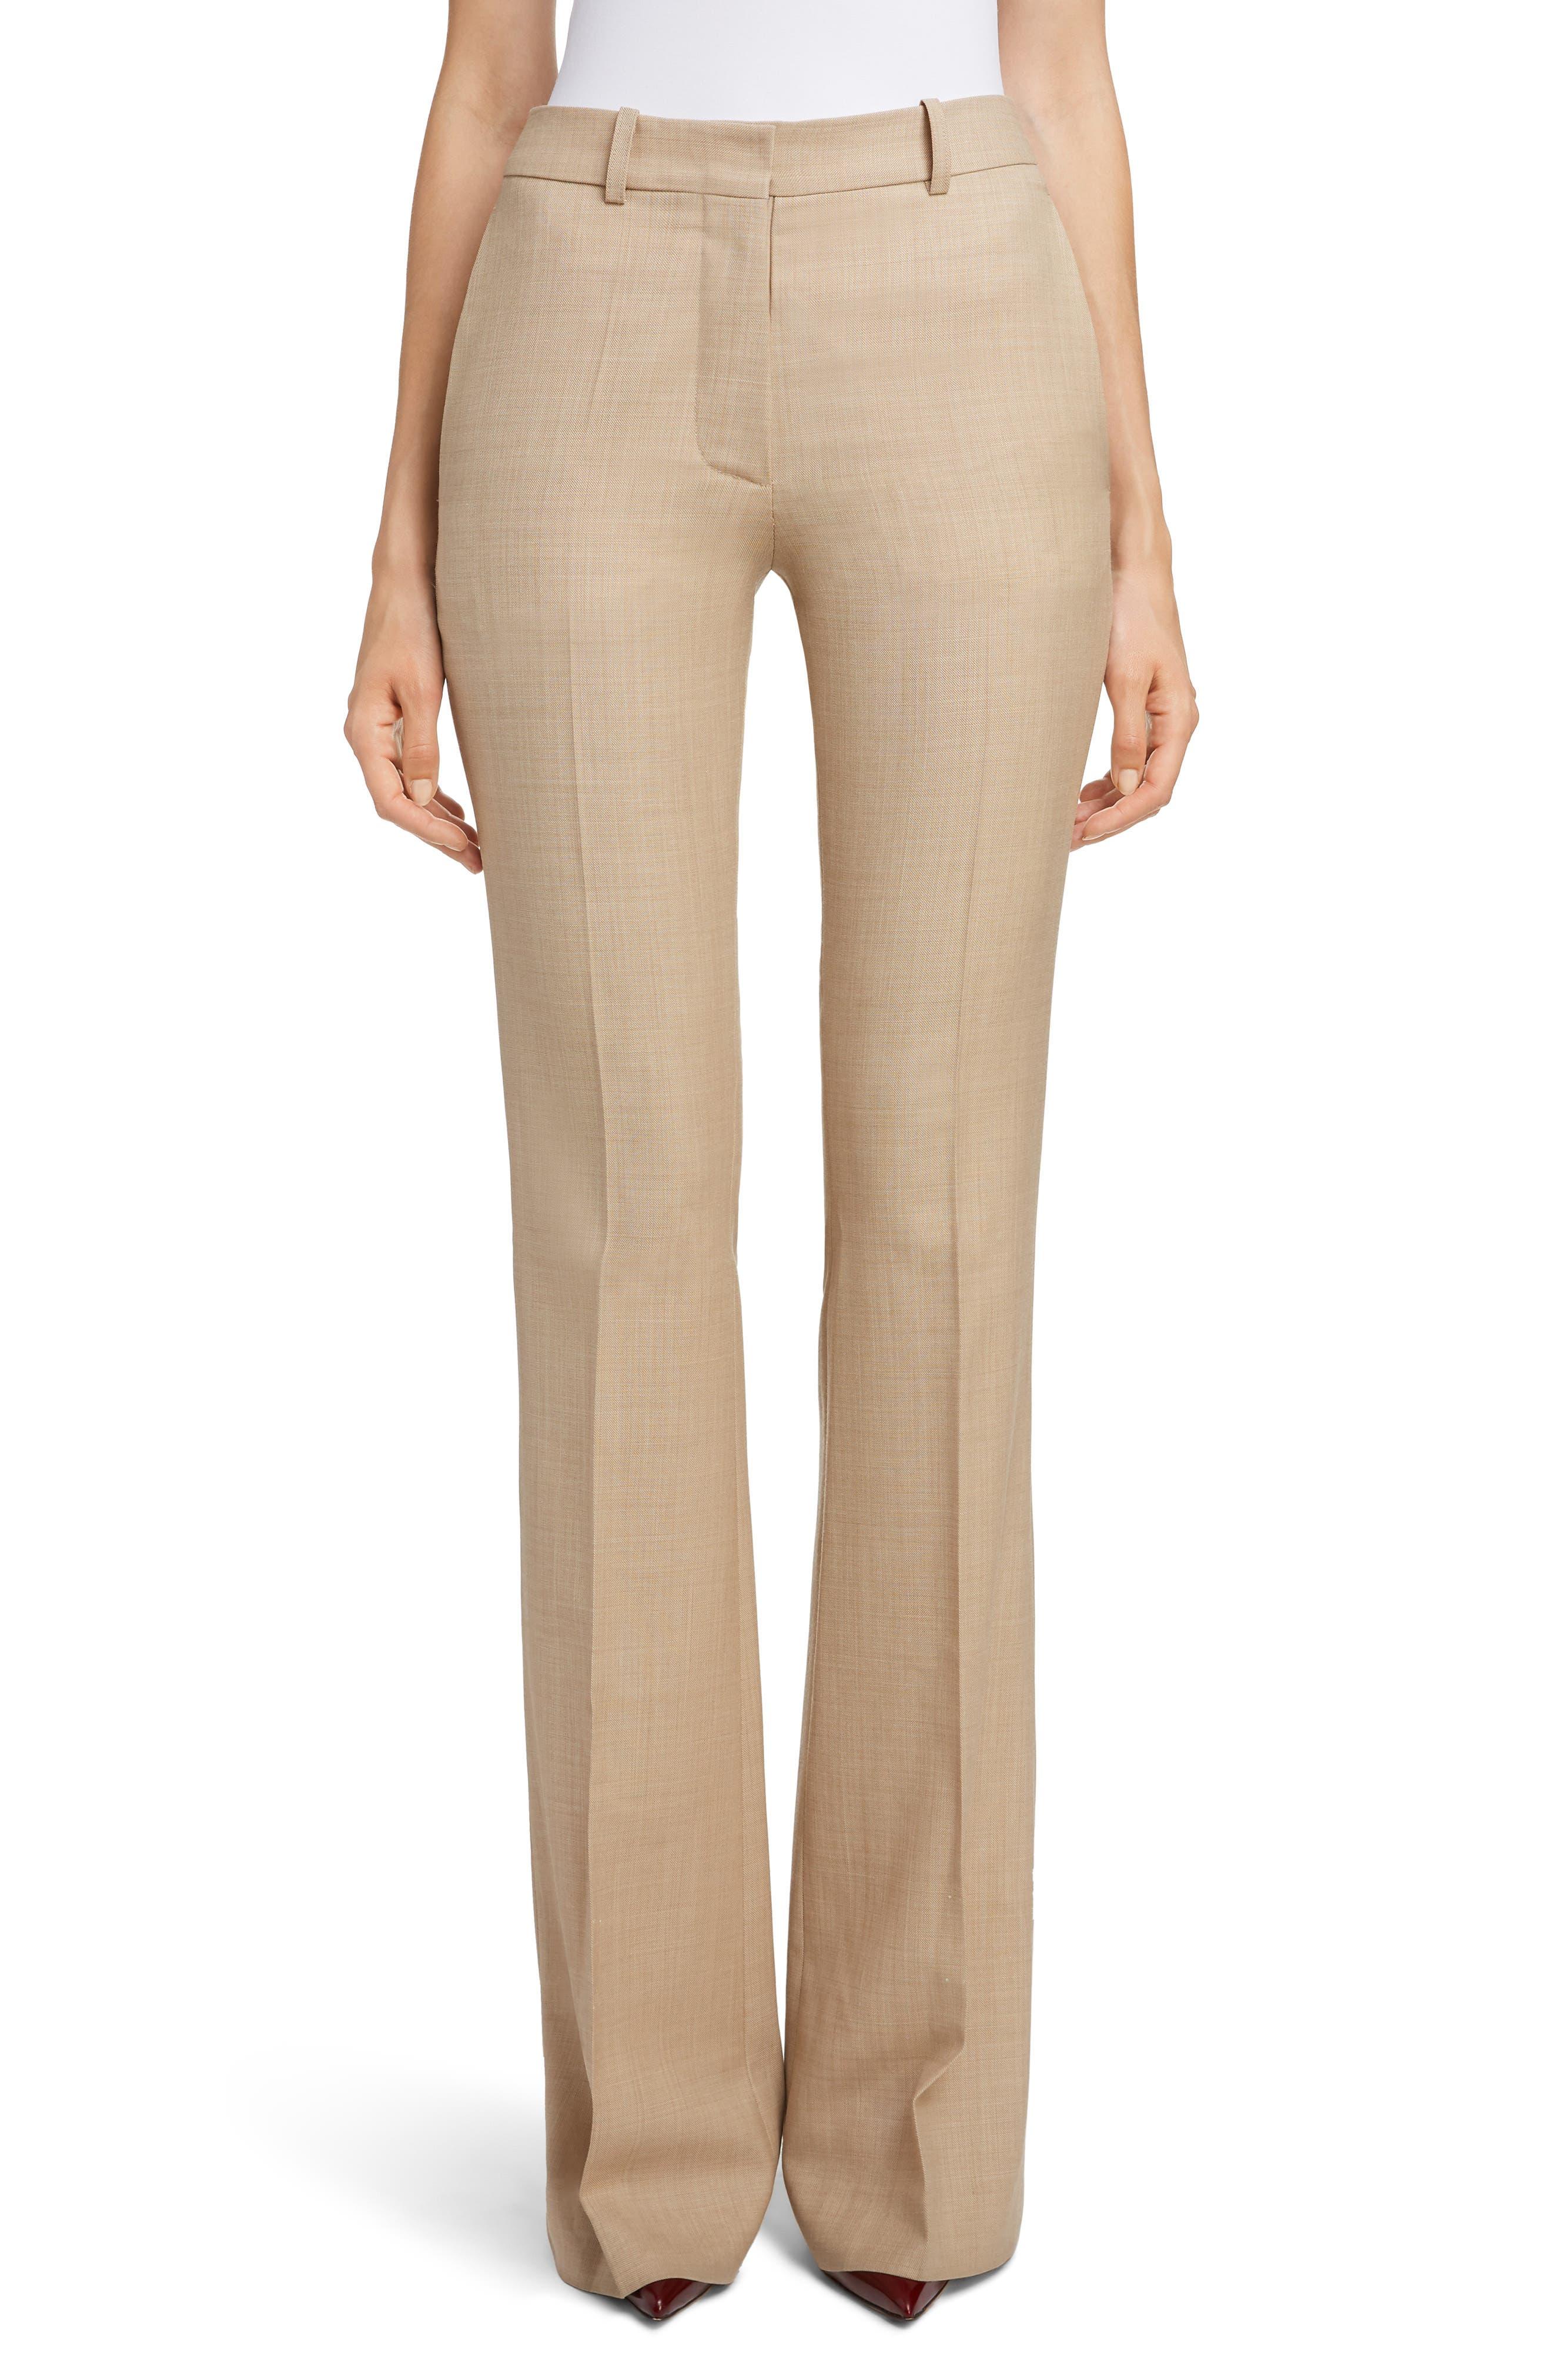 High Waist Flare Wool Pants, Main, color, LIGHT BEIGE-WHITE